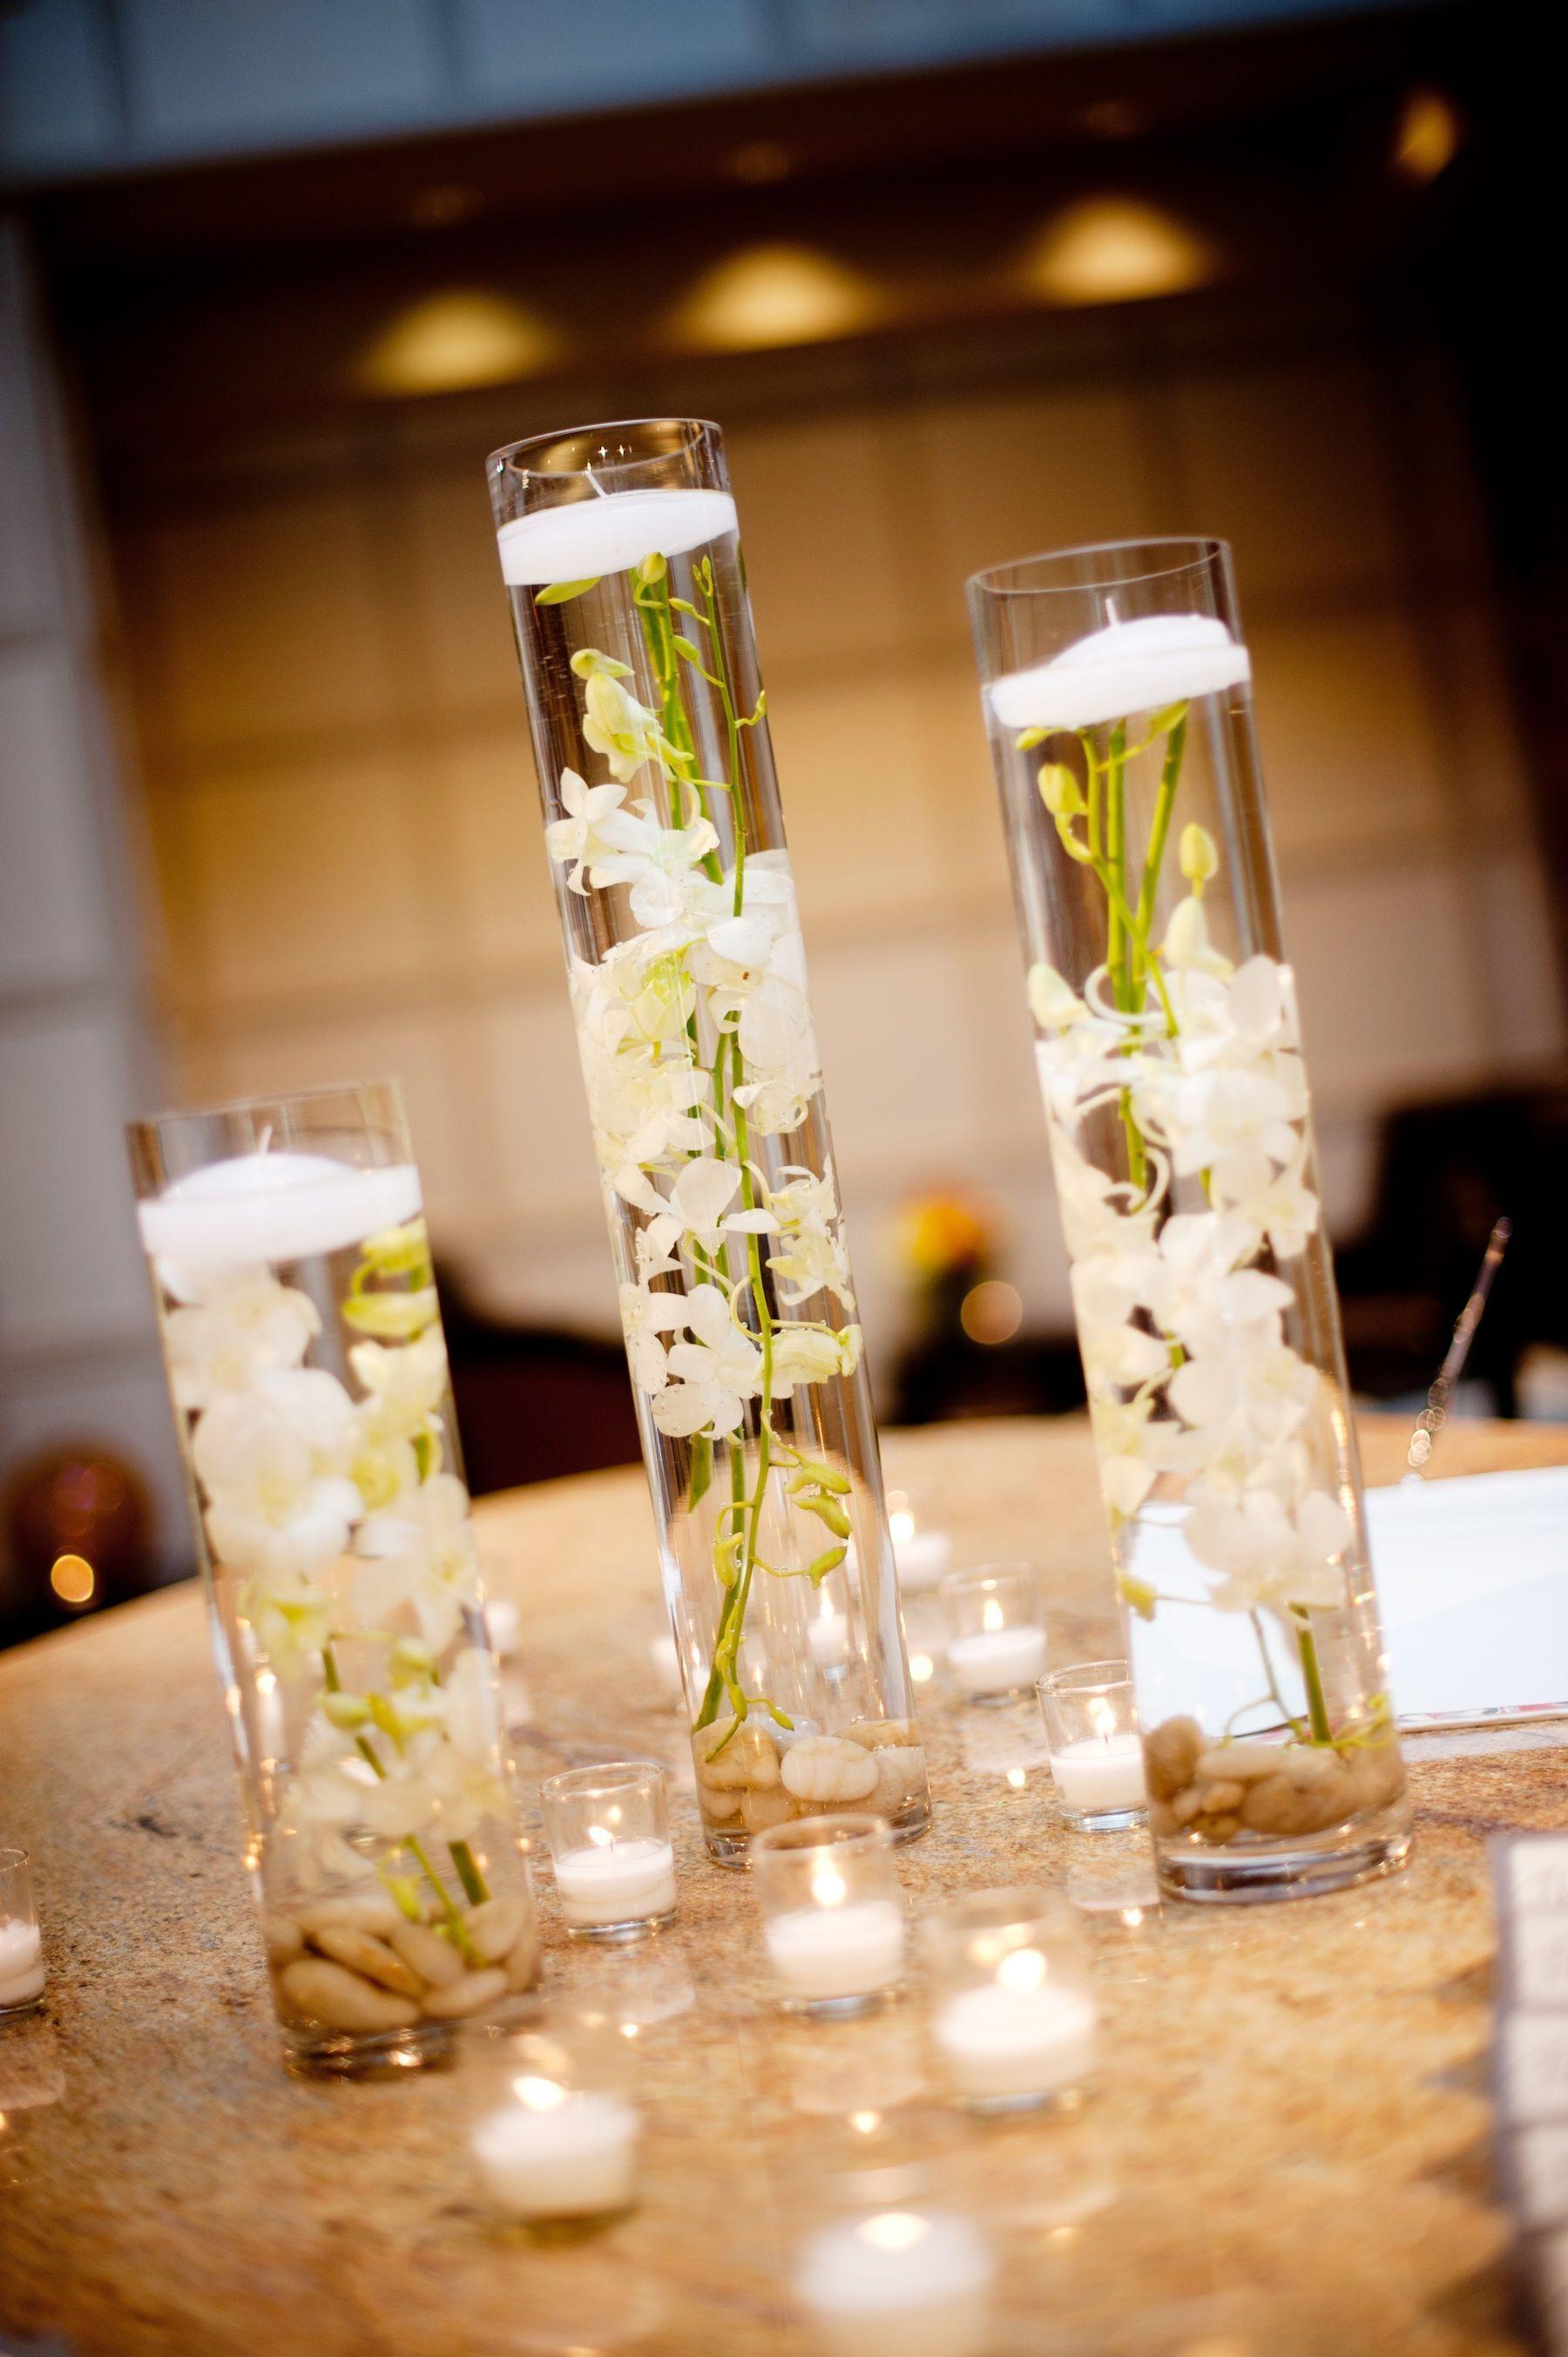 Elegant real wedding with simple diy details hurricane vases